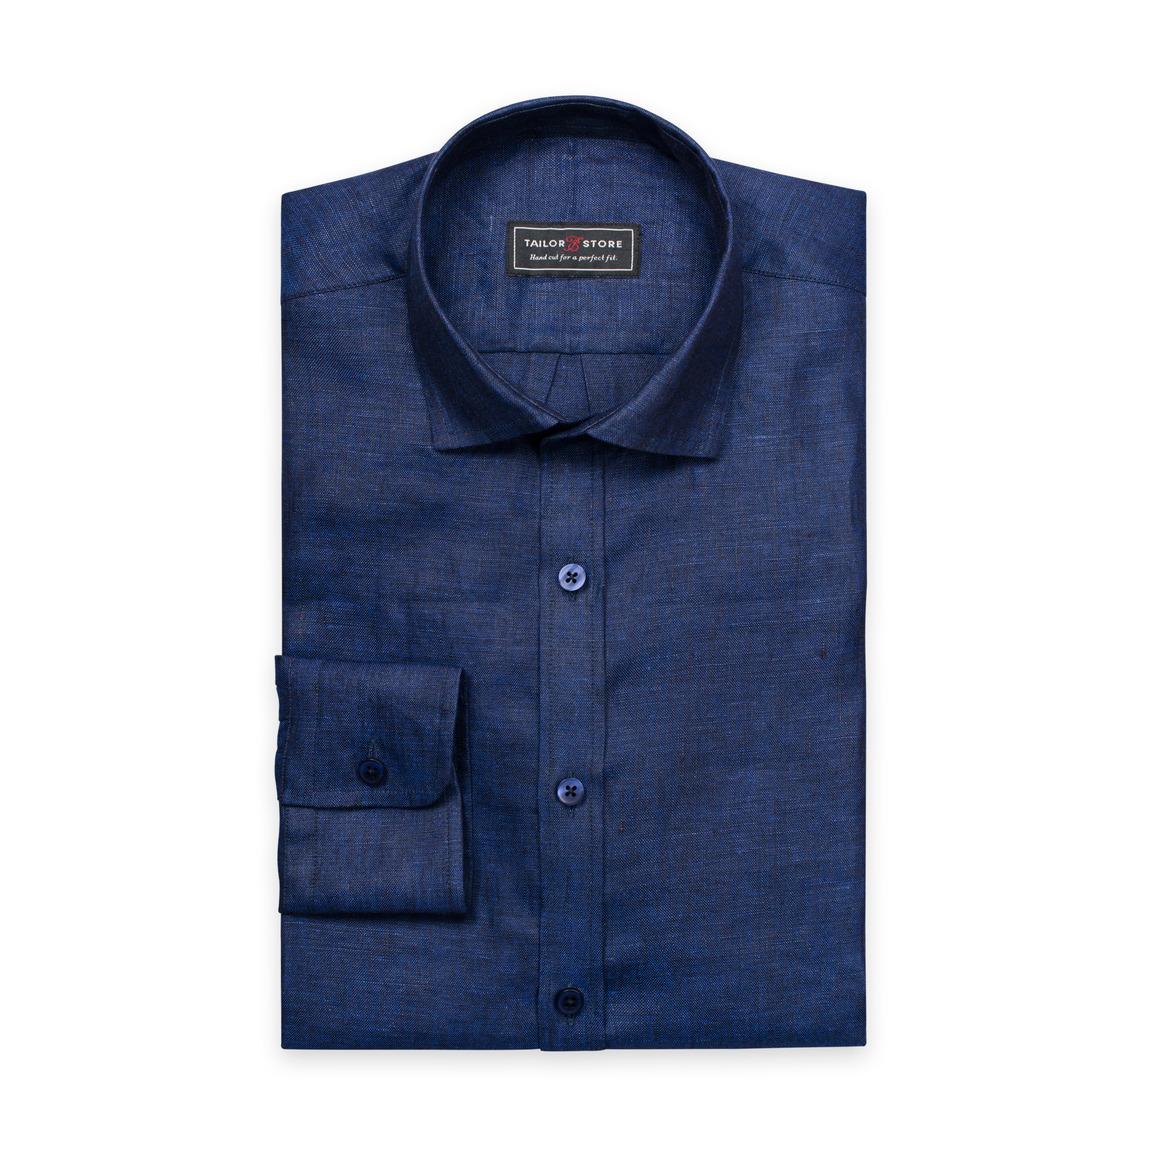 Navyblaues Leinenhemd